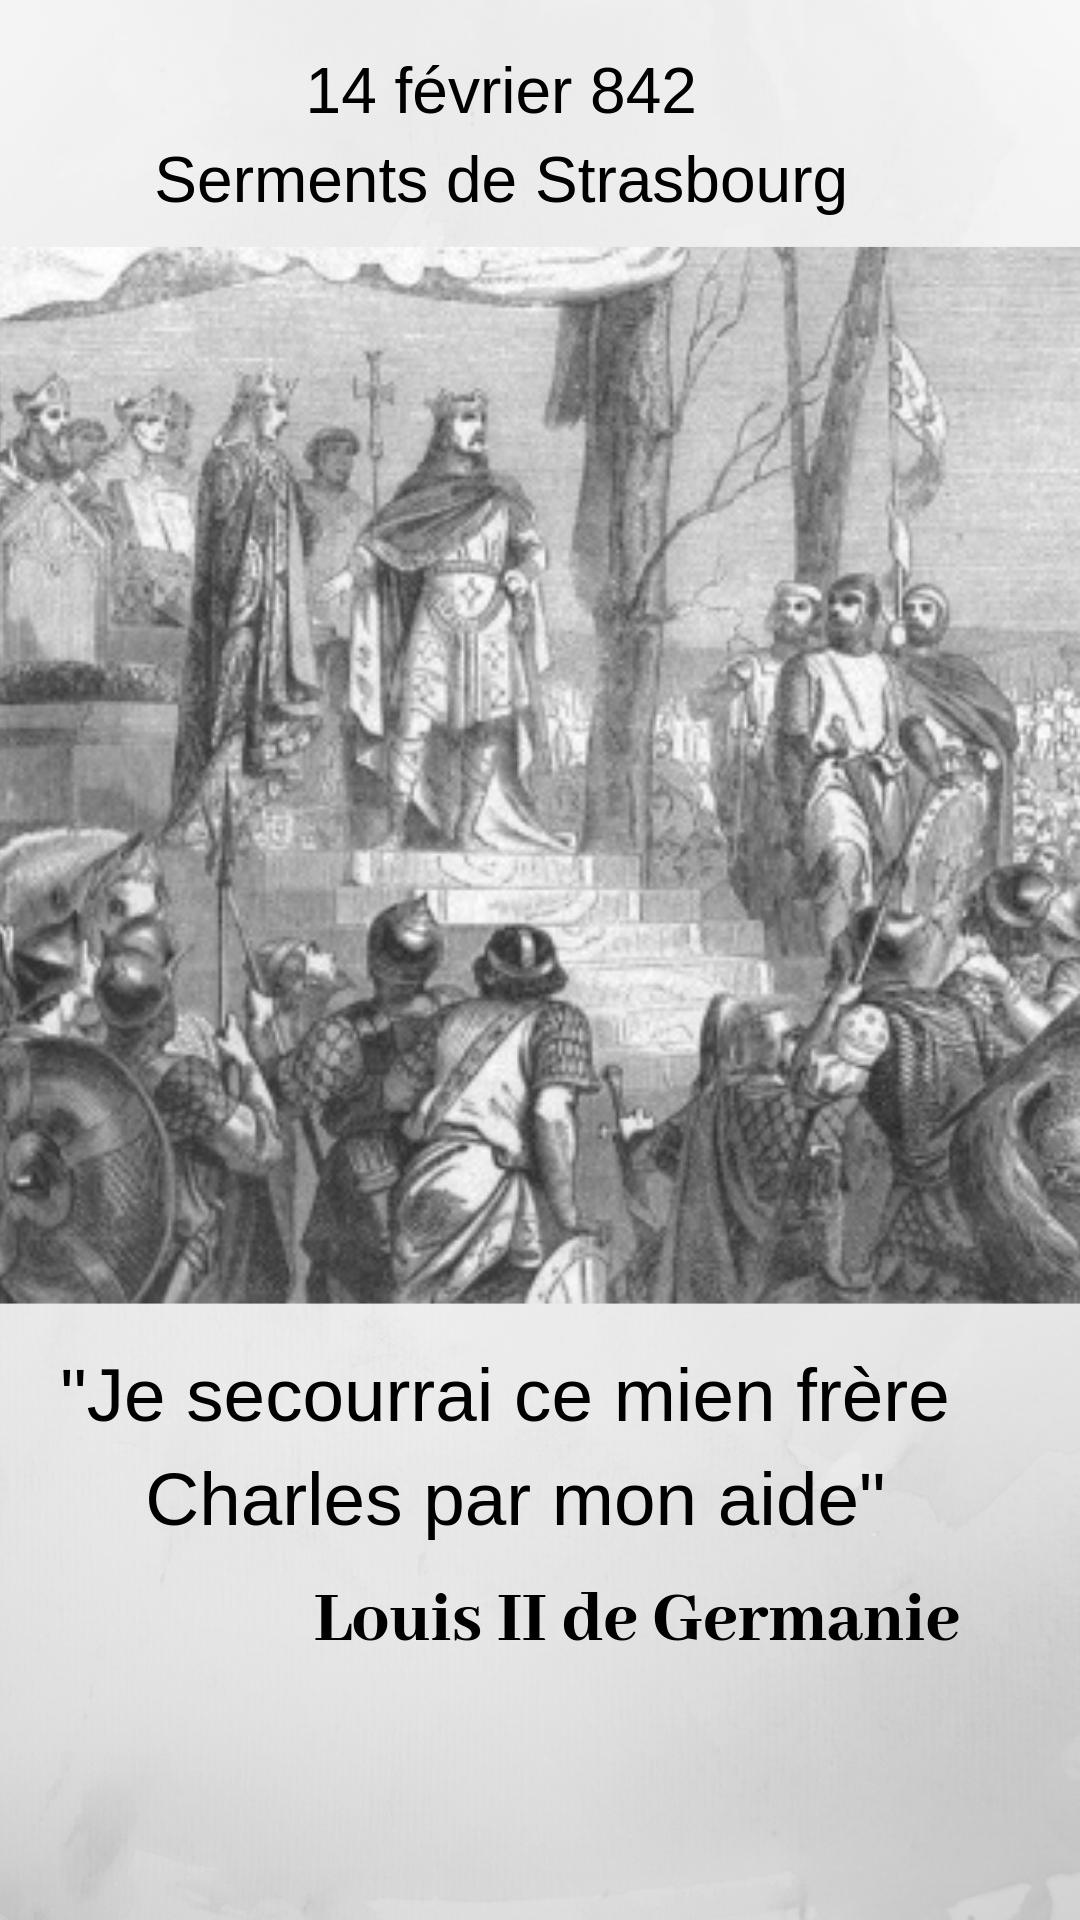 14 Fevrier 842 Serments De Strasbourg Histoire Citations Historiques Empire Carolingien